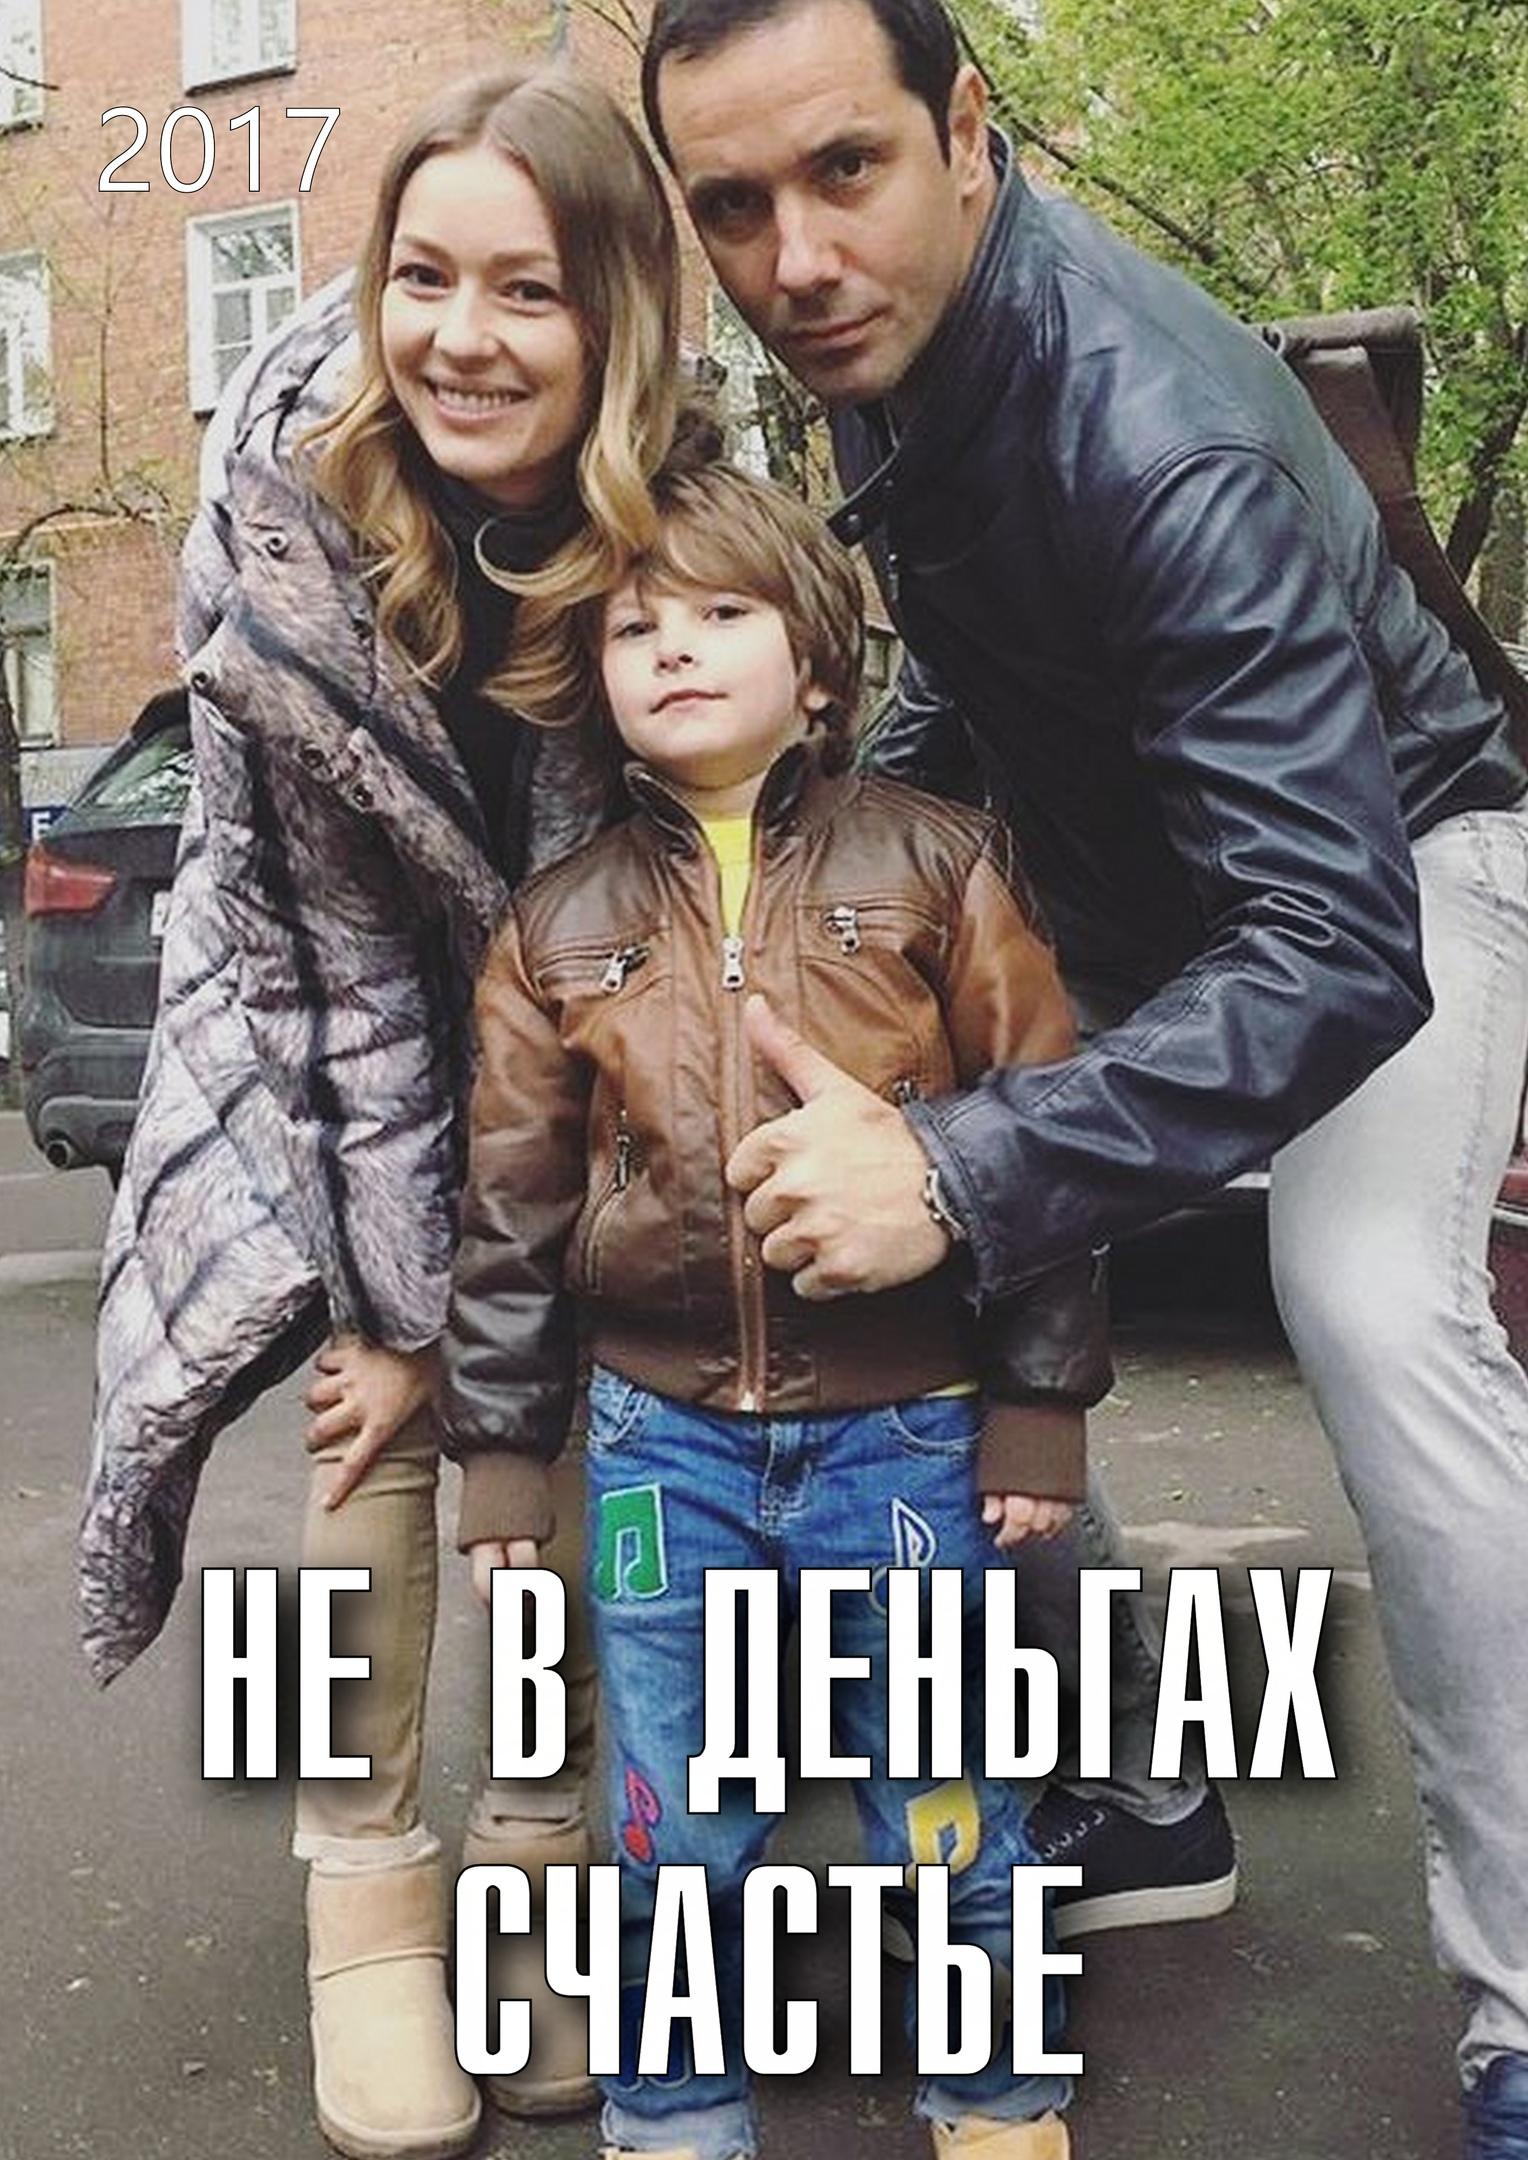 Мелодрама «He в дeньгax cчacтьe» (2017) 1-4 серия из 4 HD